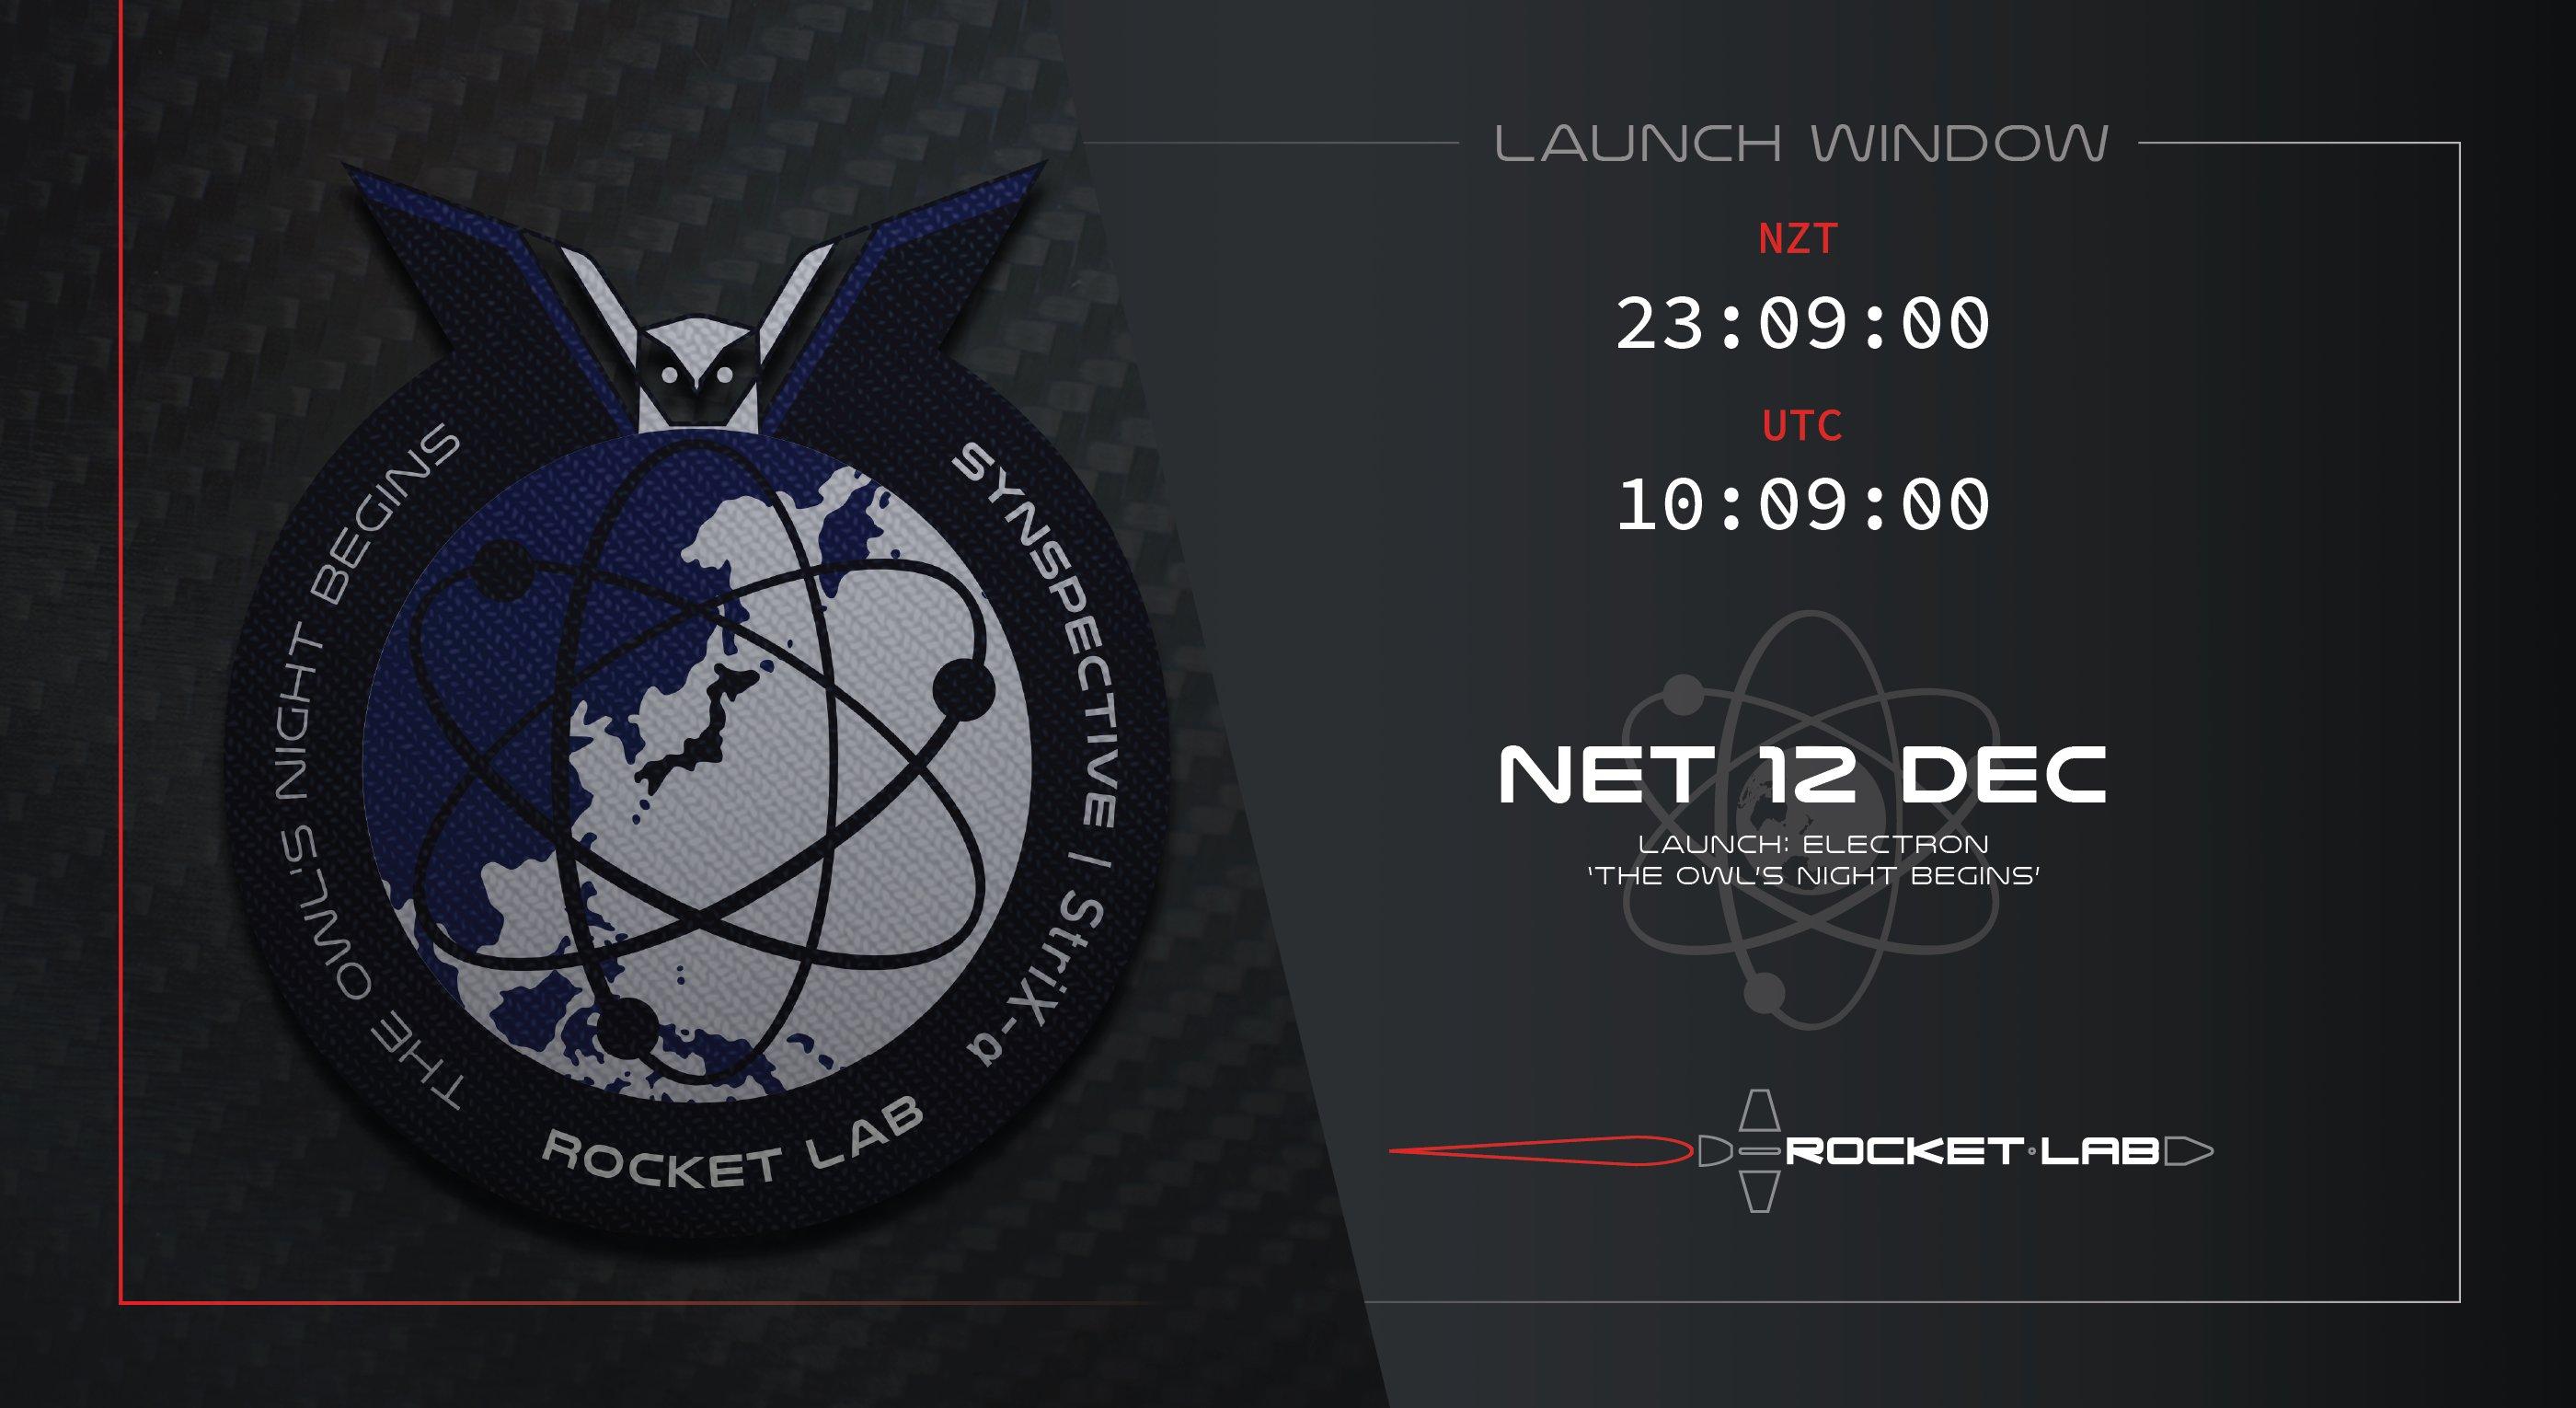 Electron • The Owl's Night Begins• 日本StriX 微米级SAR卫星任务